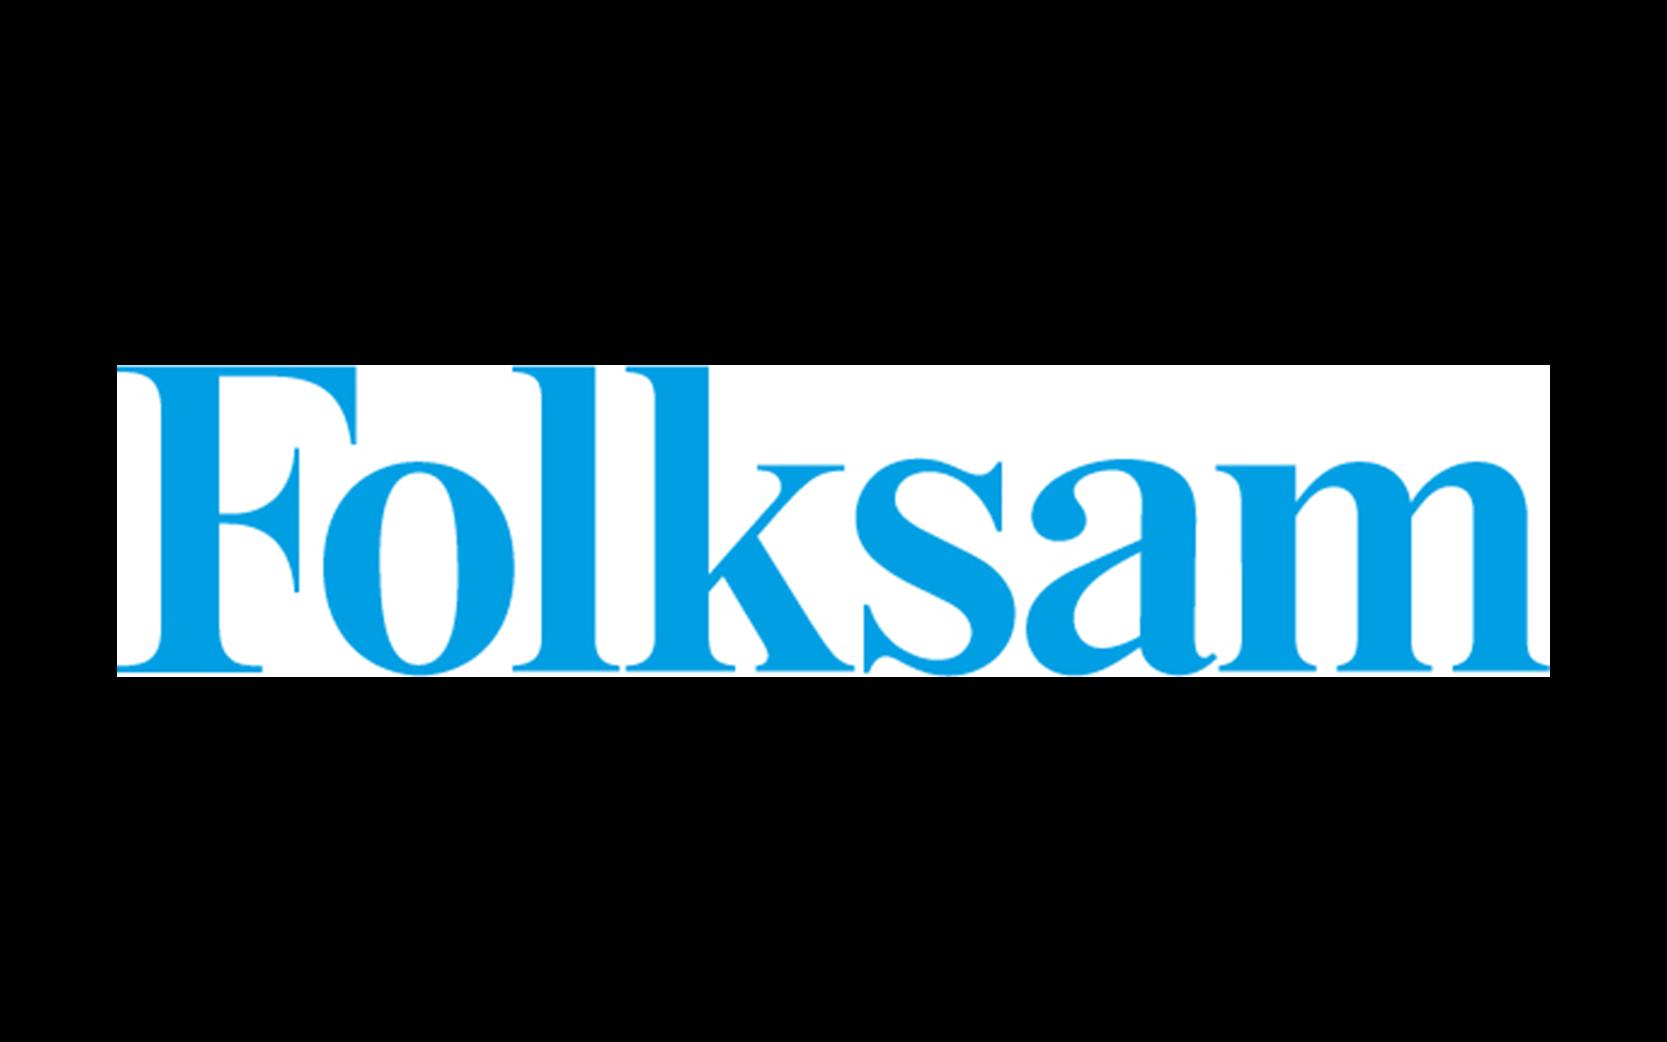 Folksams logotyp